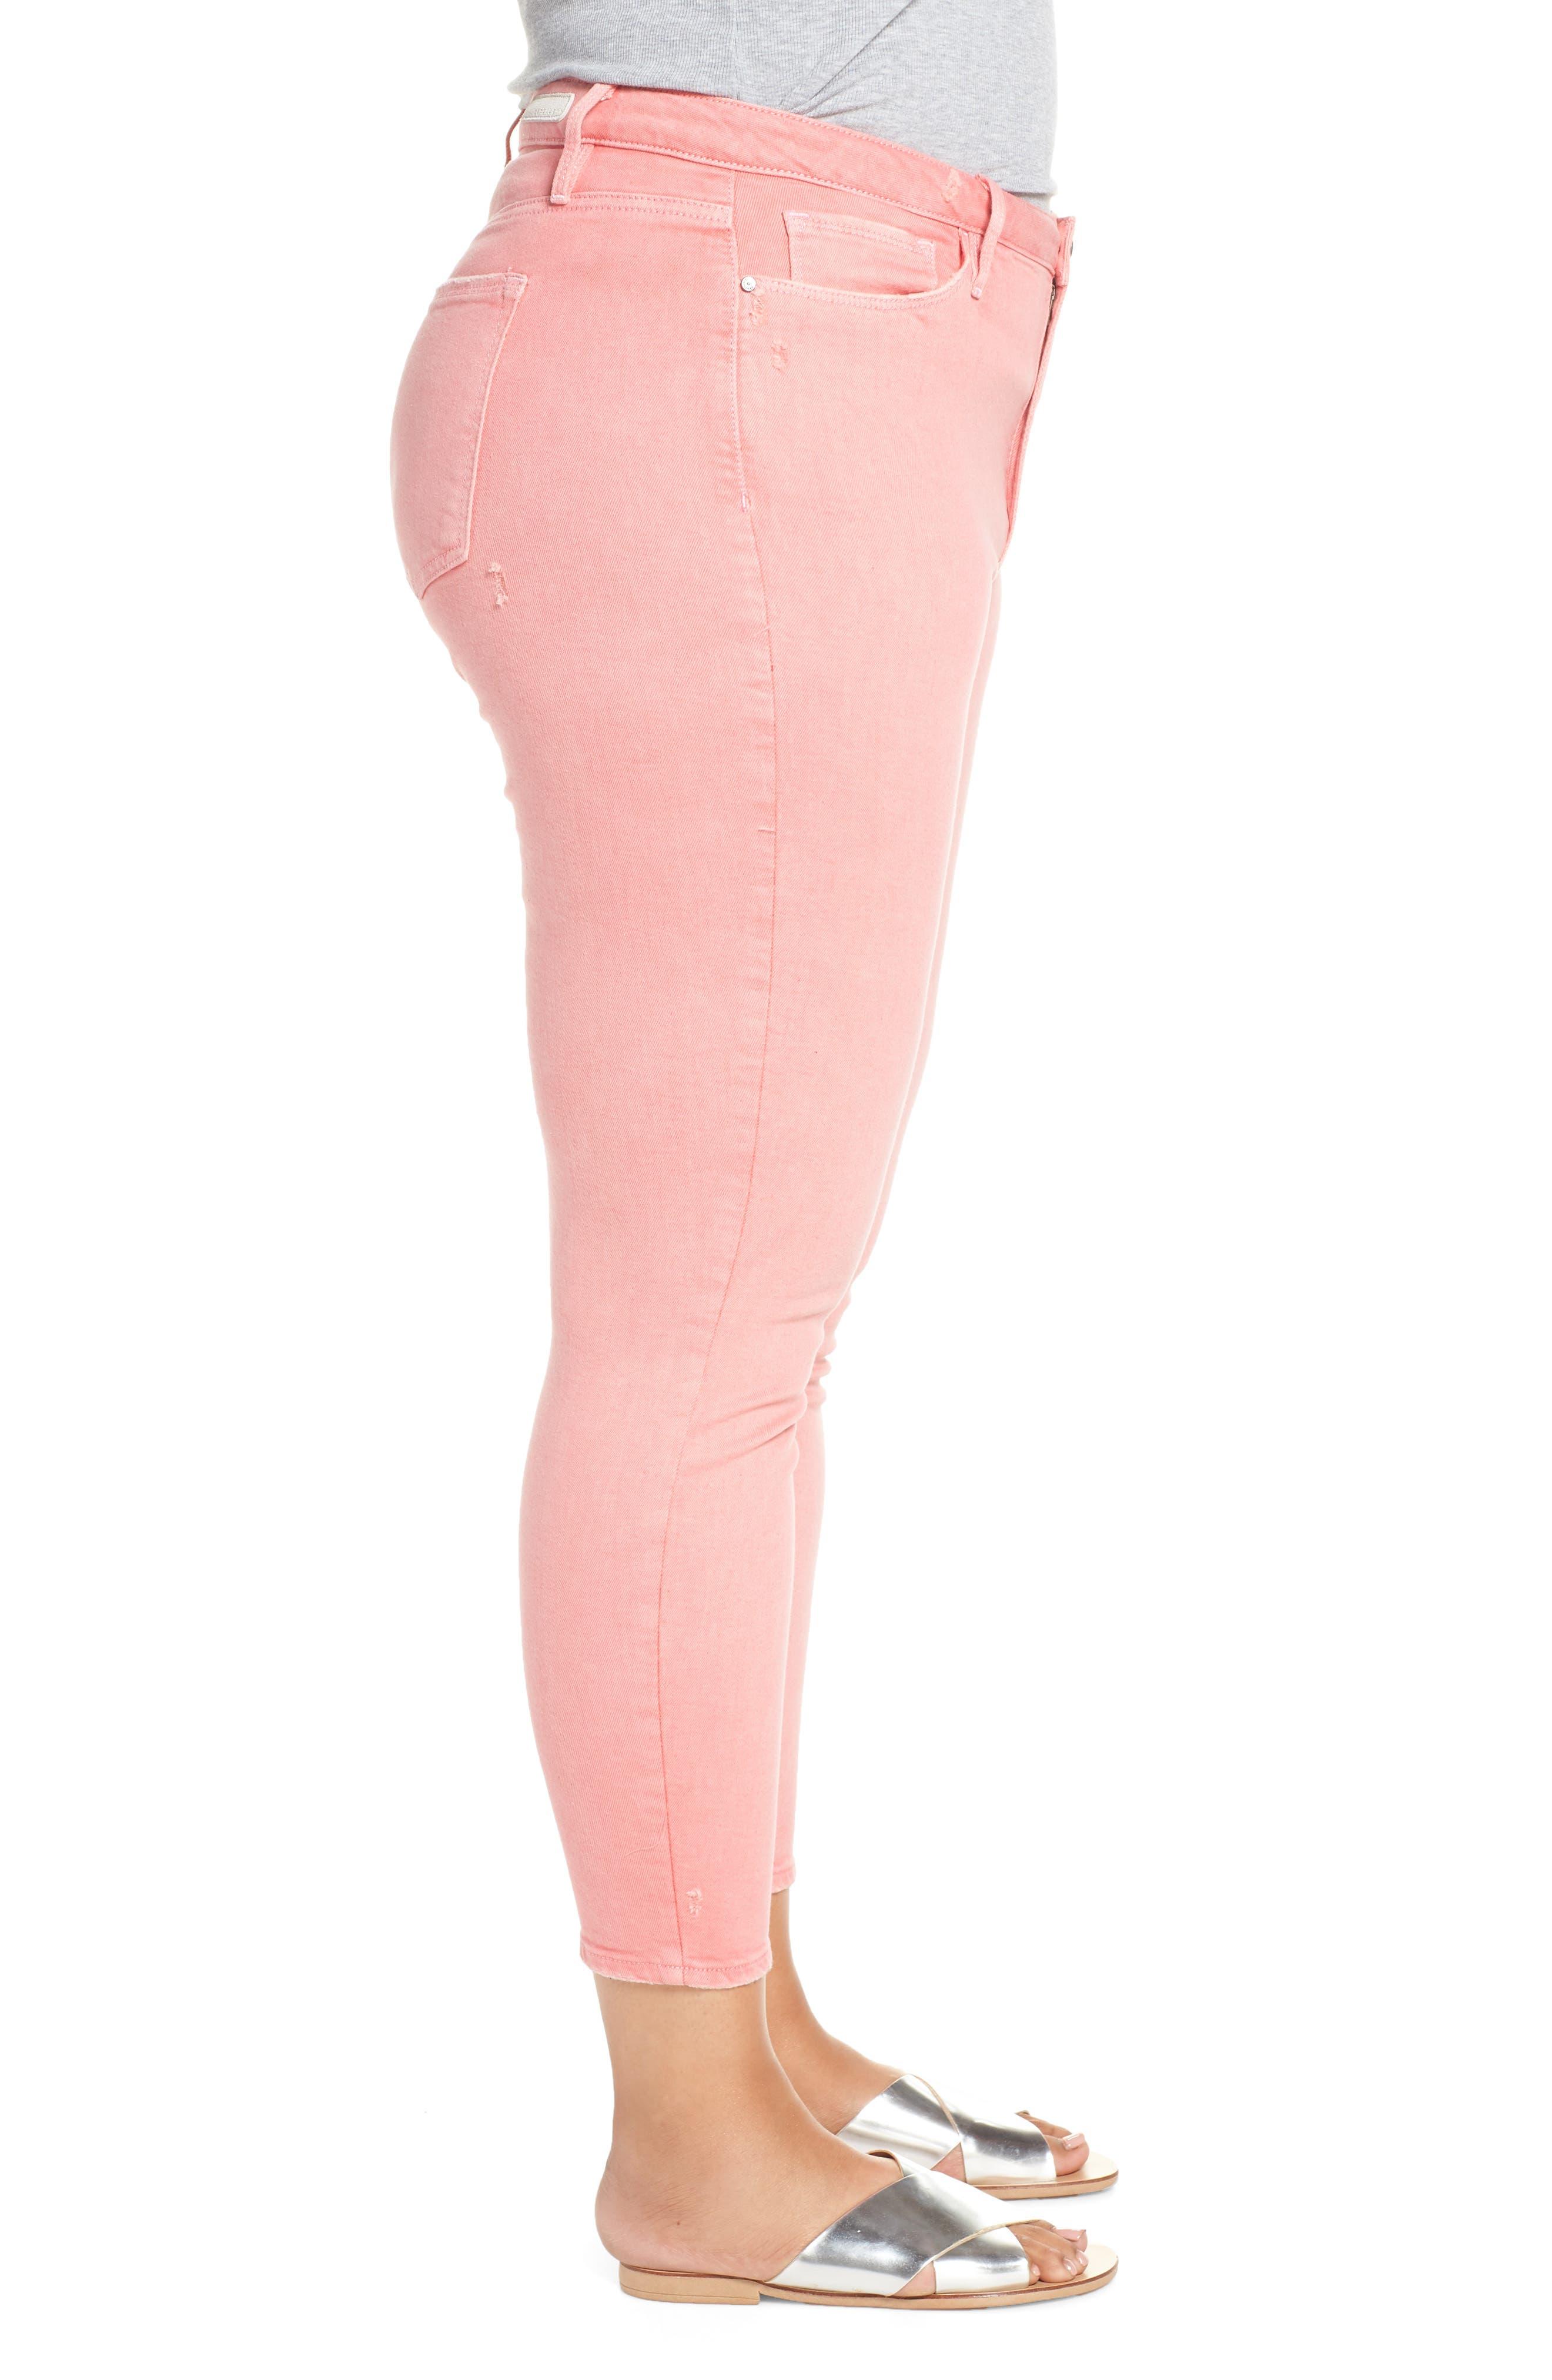 SANCTUARY,                             Social Standard Ankle Skinny Jeans,                             Alternate thumbnail 3, color,                             DK PNK FIZ